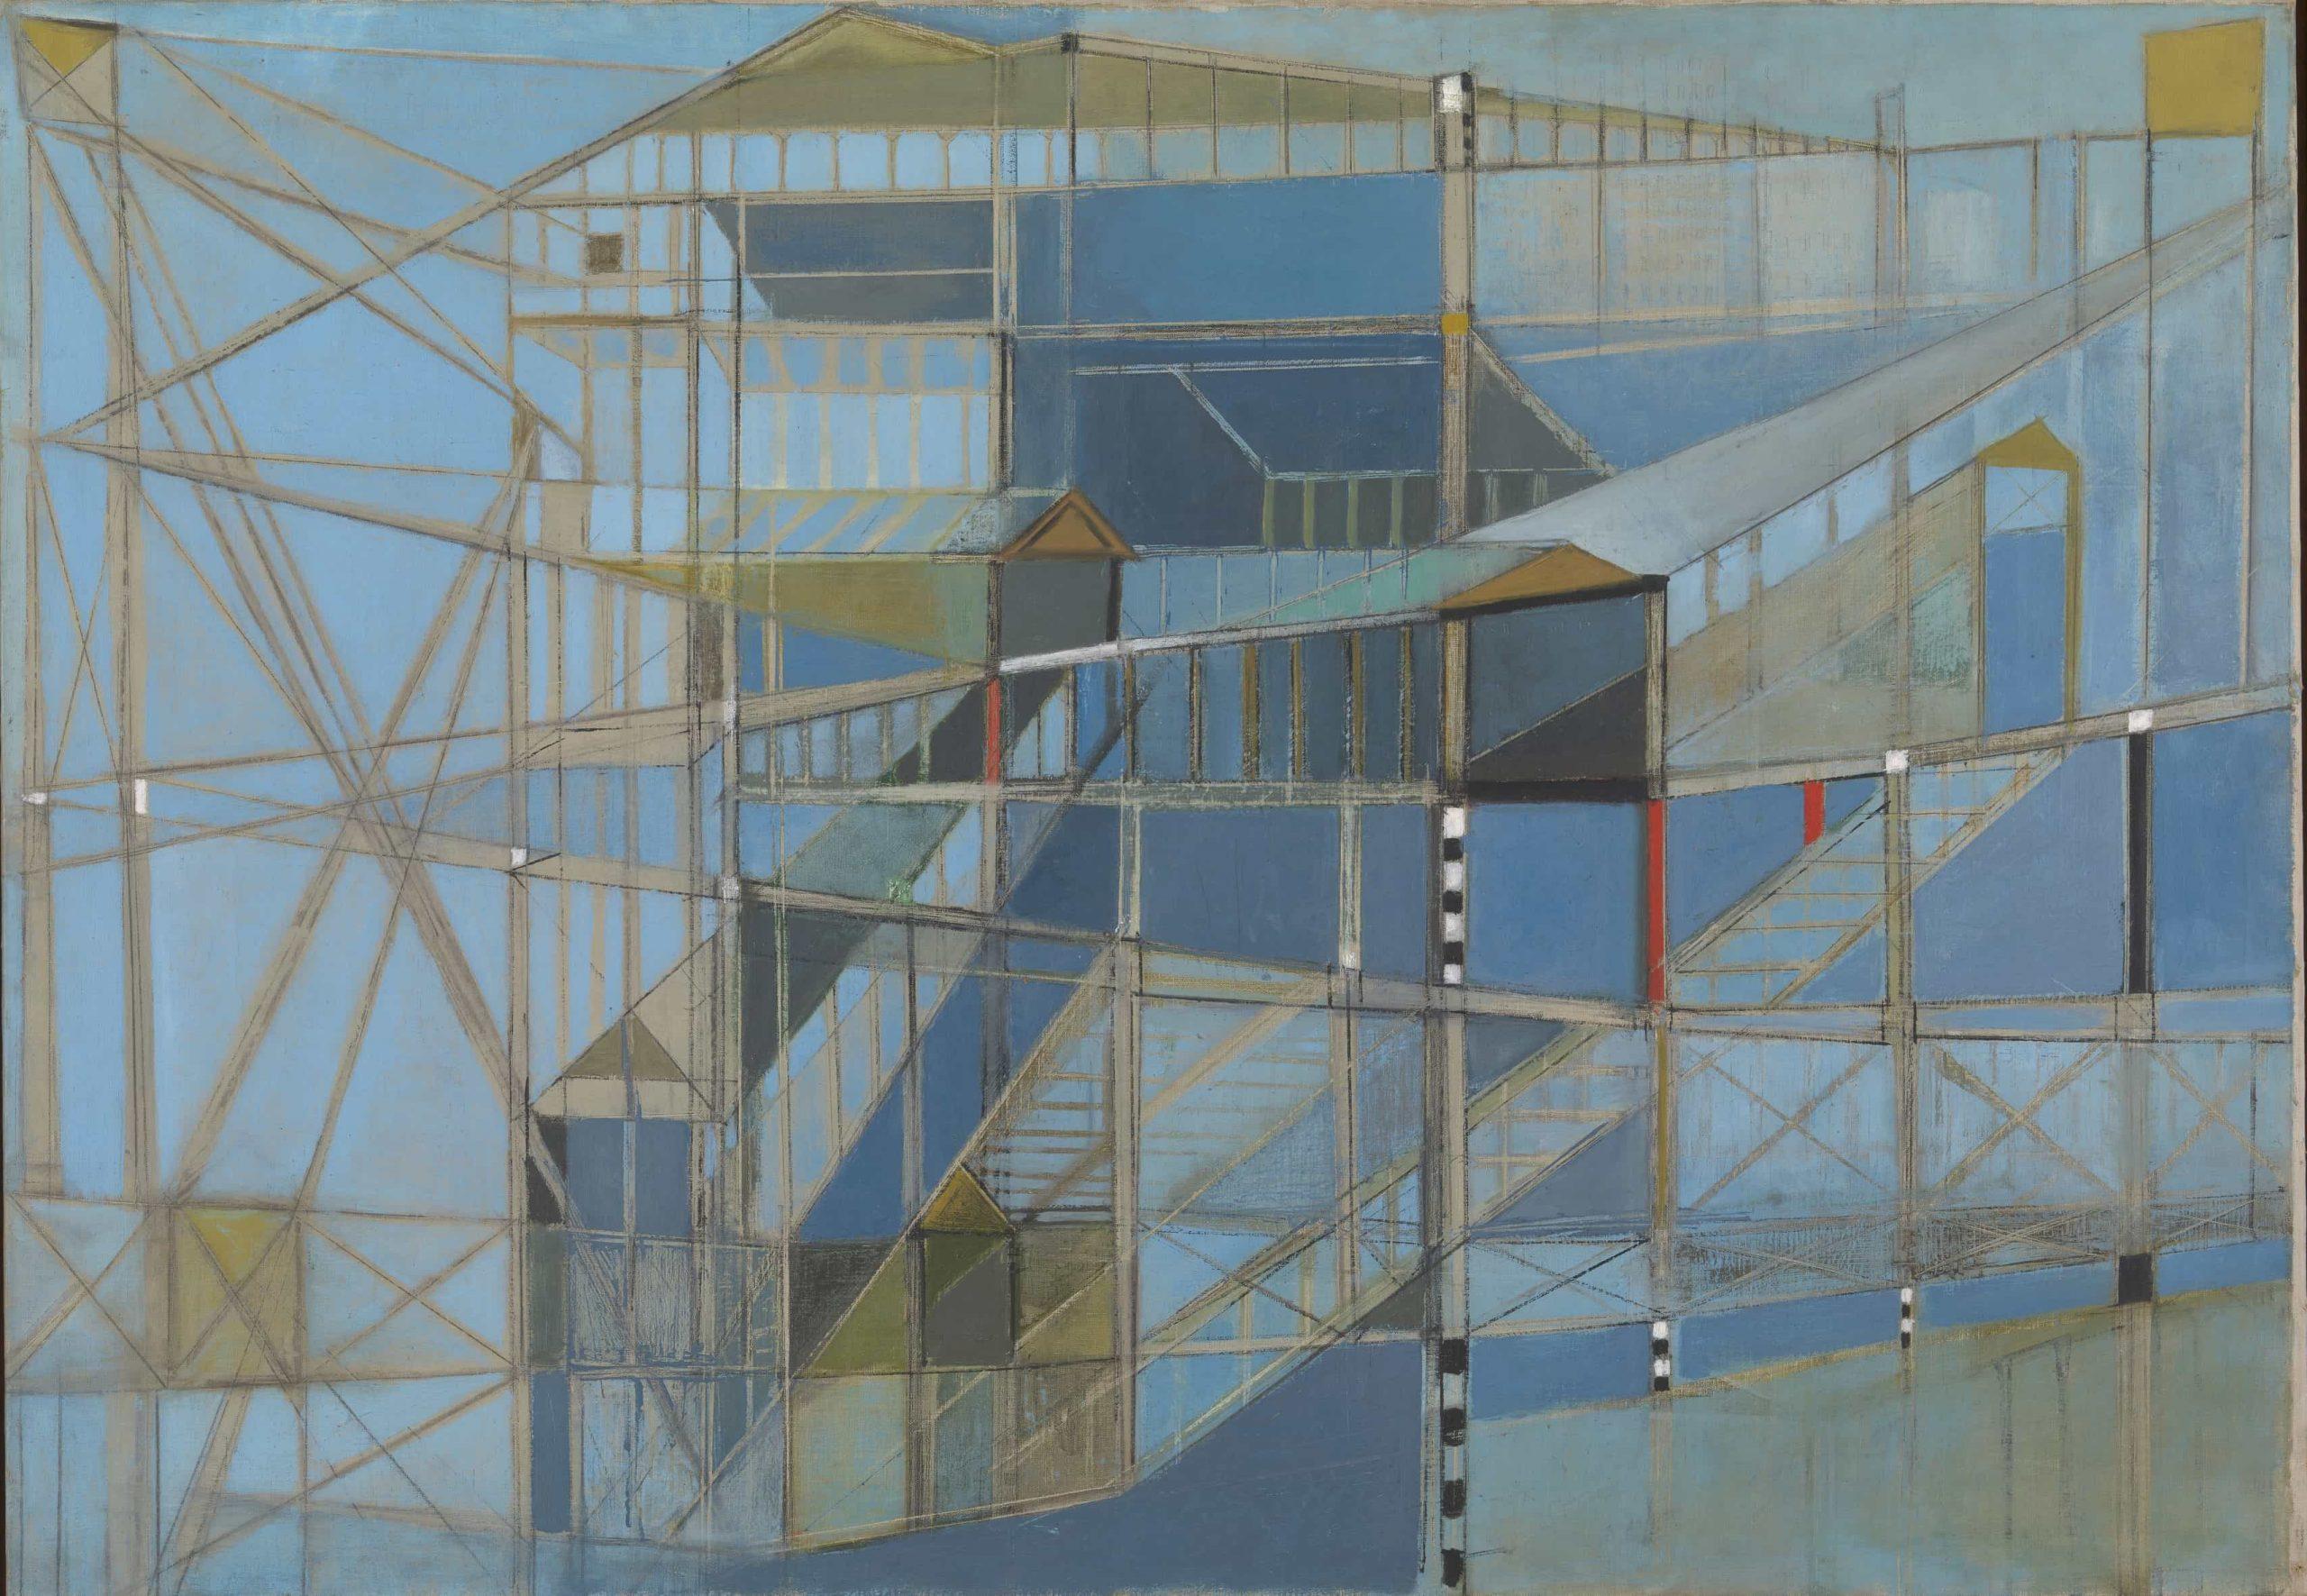 Hedda Sterne, NY, NY No. X , 1948. Óleo sobre lienzo. 83,5 x 118,5 cm. Tate, Londres. Donación de Clara Diament Sujo, 2012 (Inv.: T13861) © Hedda Sterne, VEGAP, Madrid, 2019